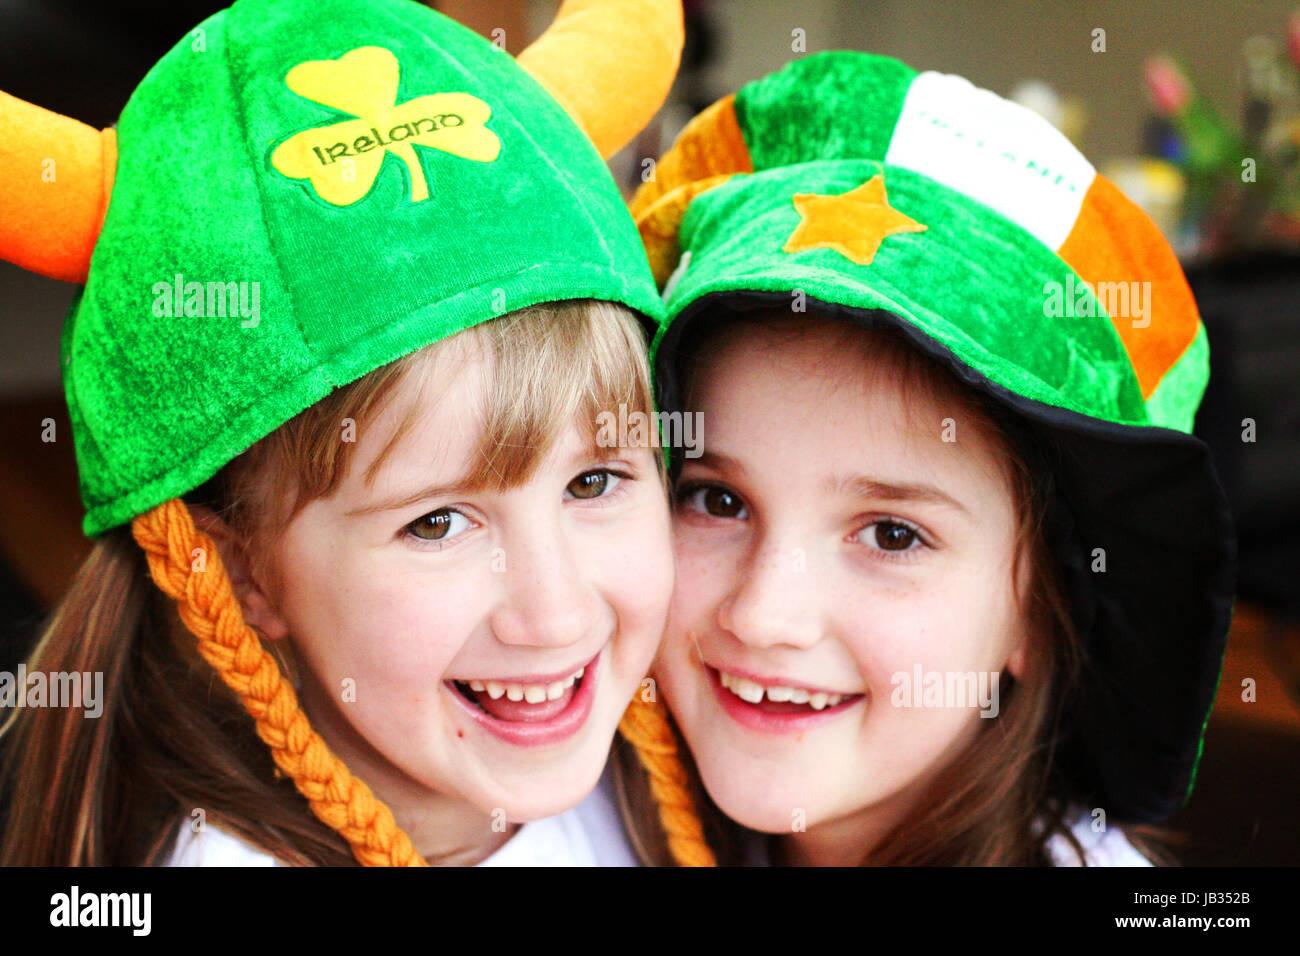 Two girls, children hugging wearing St. Patrick's Day hats in Dublin Ireland - Stock Image